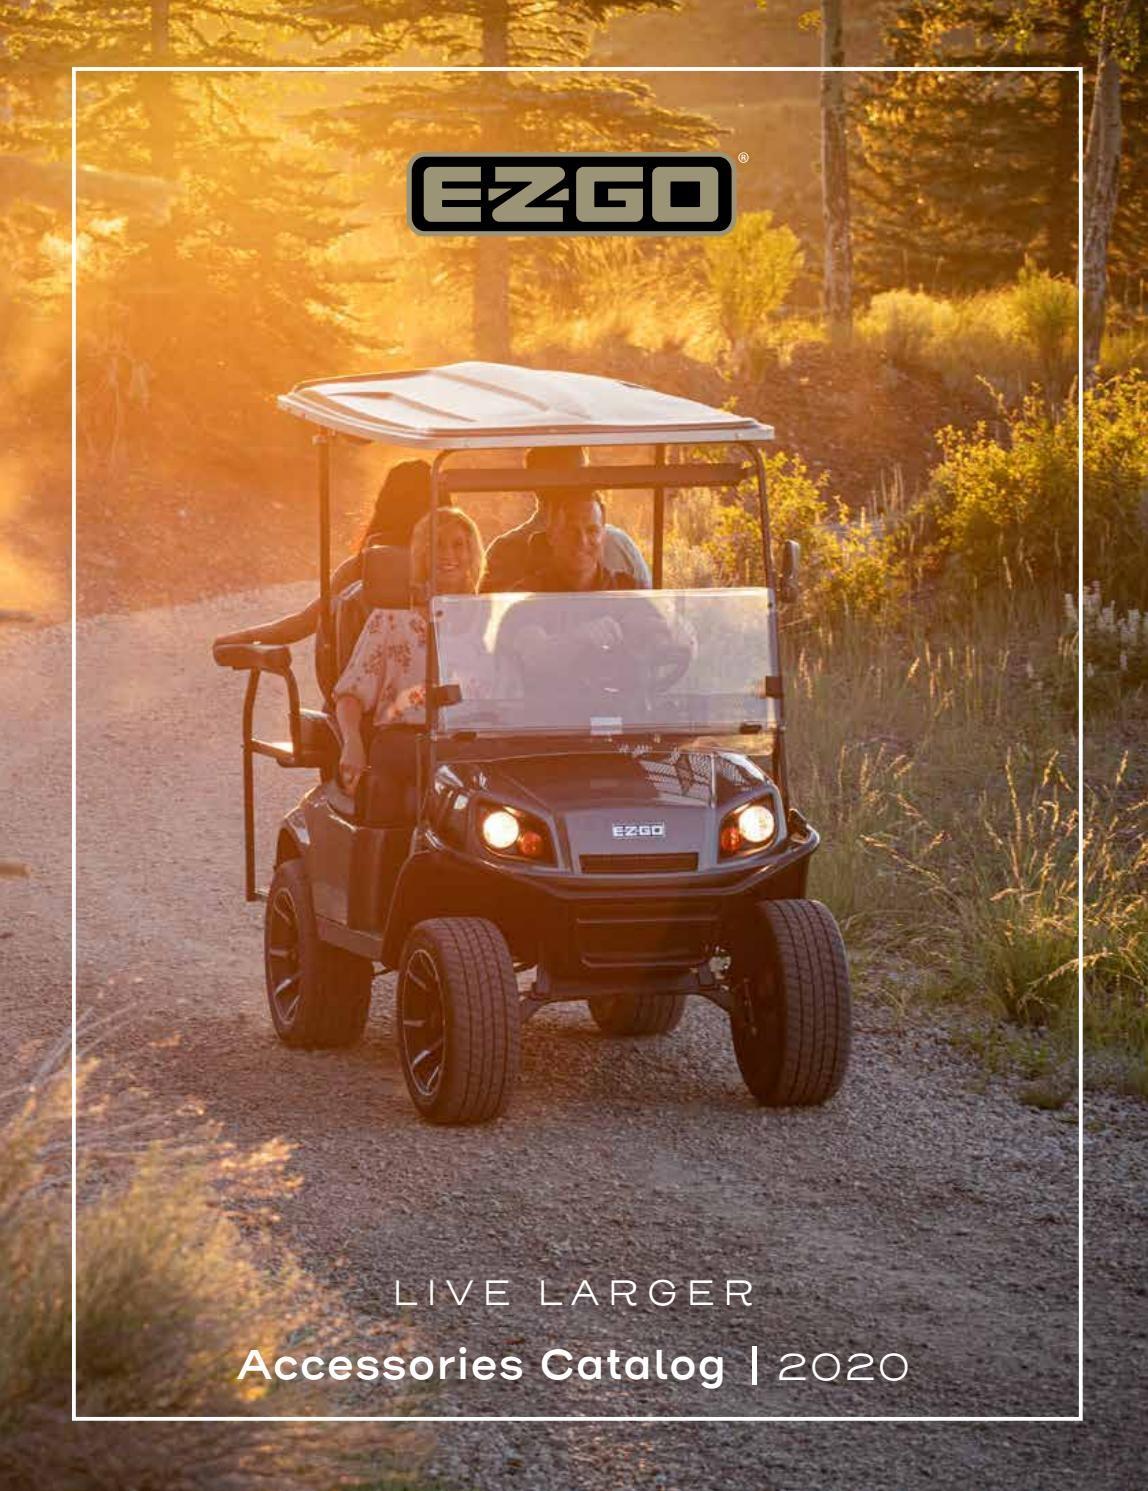 2020 accessories catalog 14th edition final digita